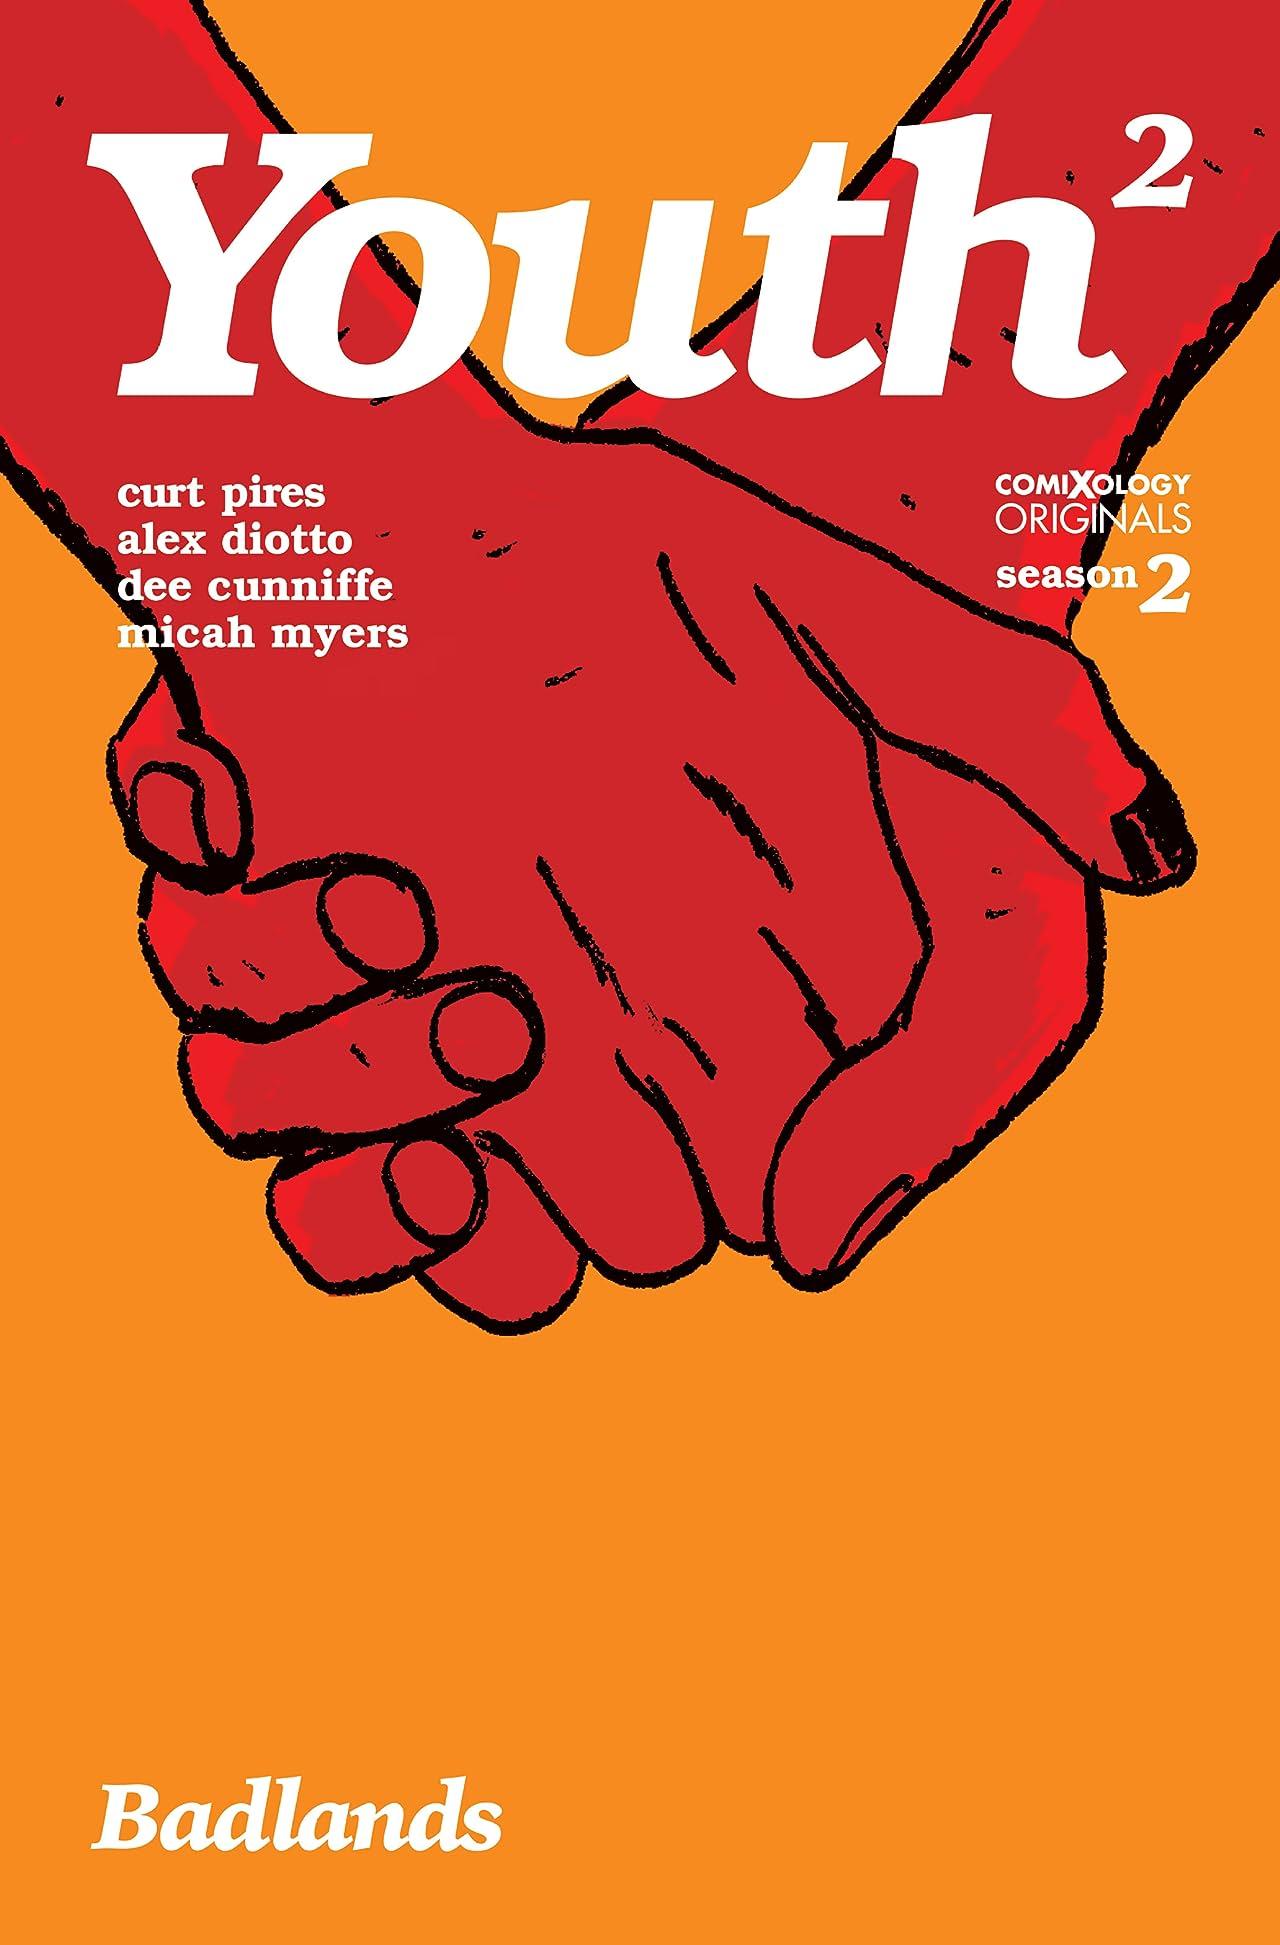 Youth Season Two (comiXology Originals)